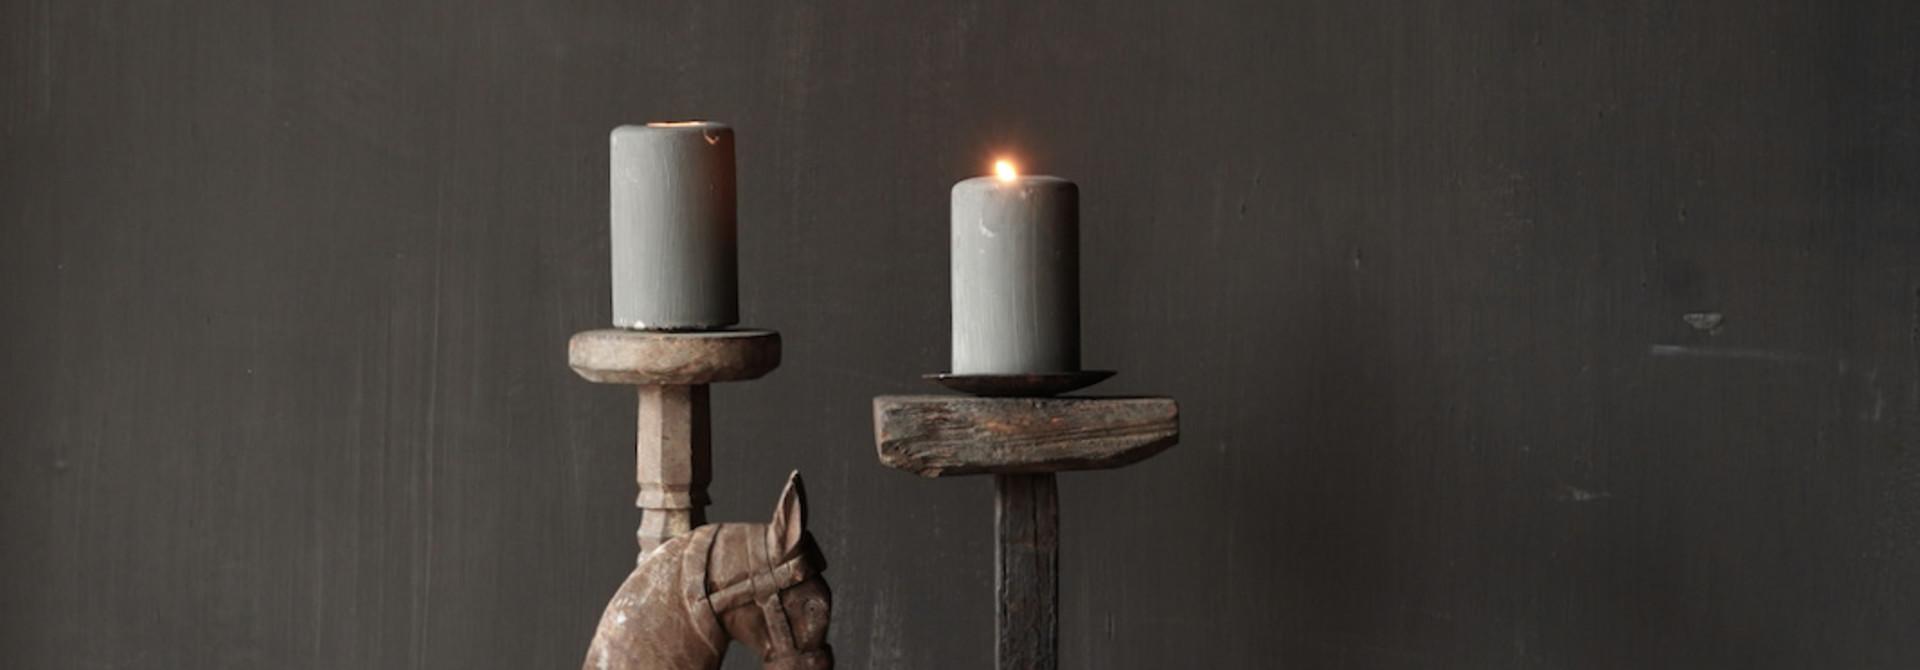 Holzpferd handgefertigt aus altem Holz